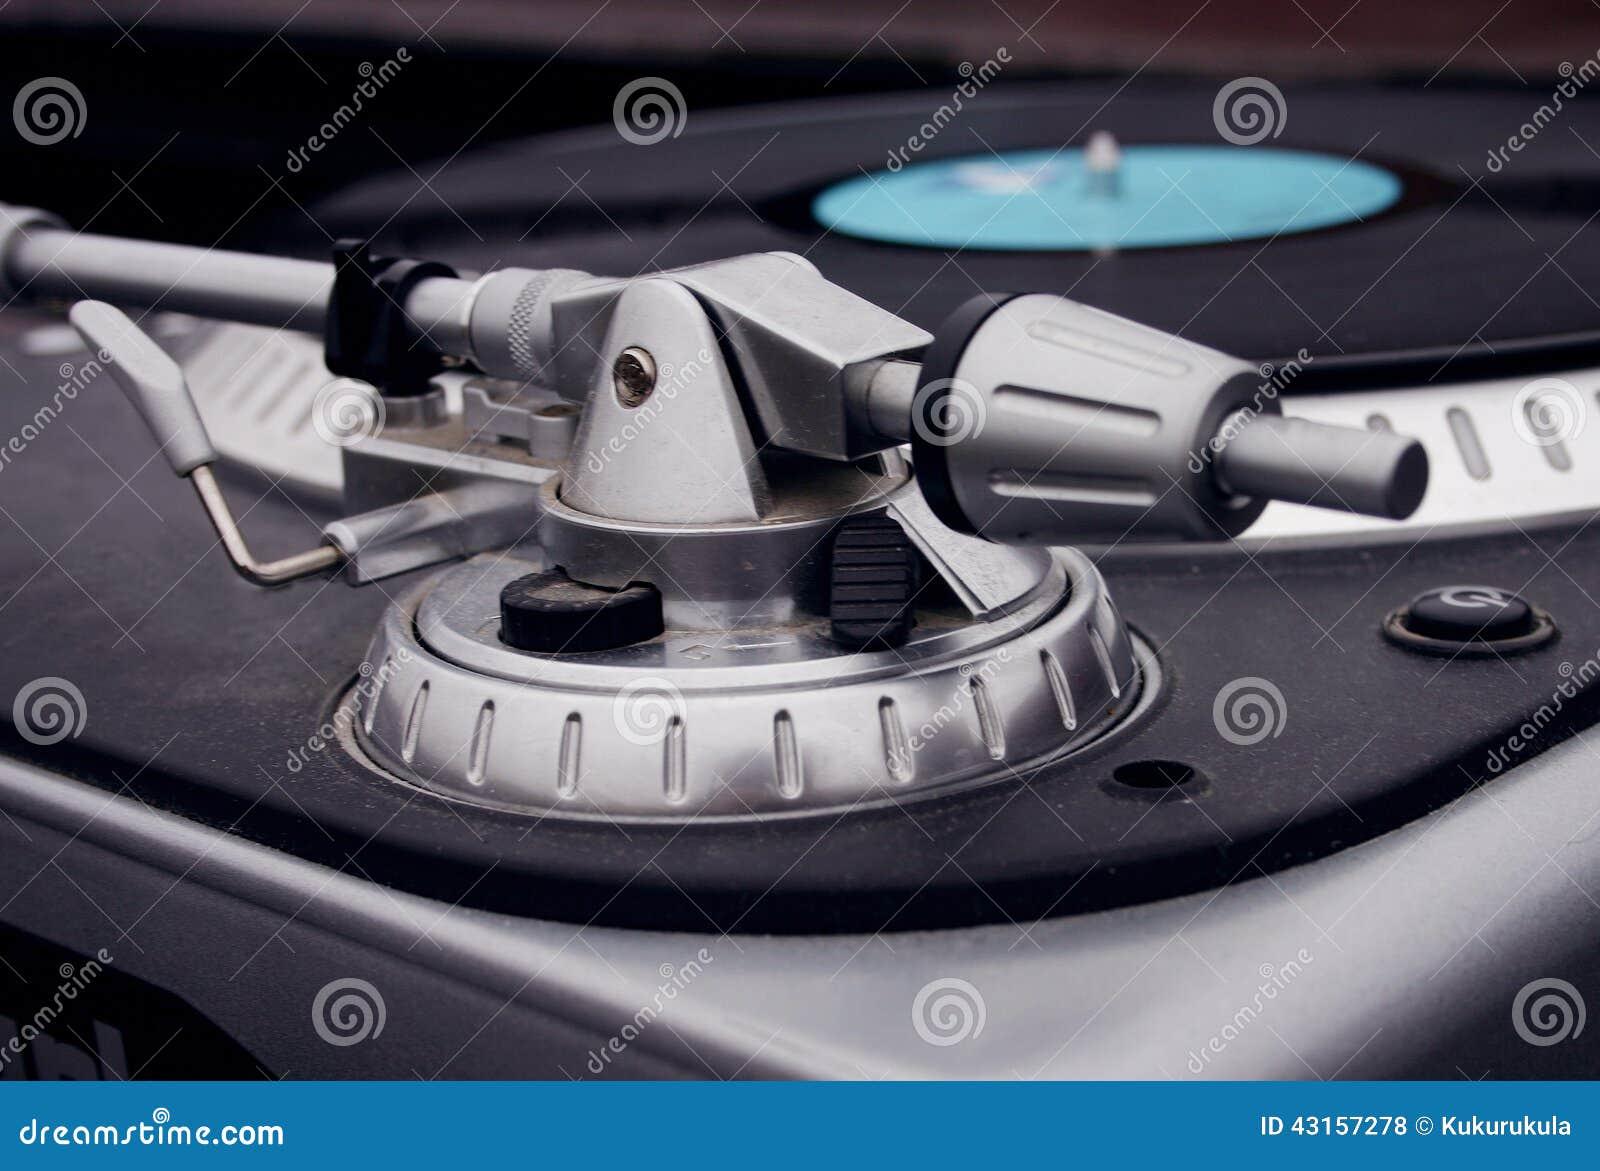 professional dj turntable set stock photo image of musical player 43157278. Black Bedroom Furniture Sets. Home Design Ideas